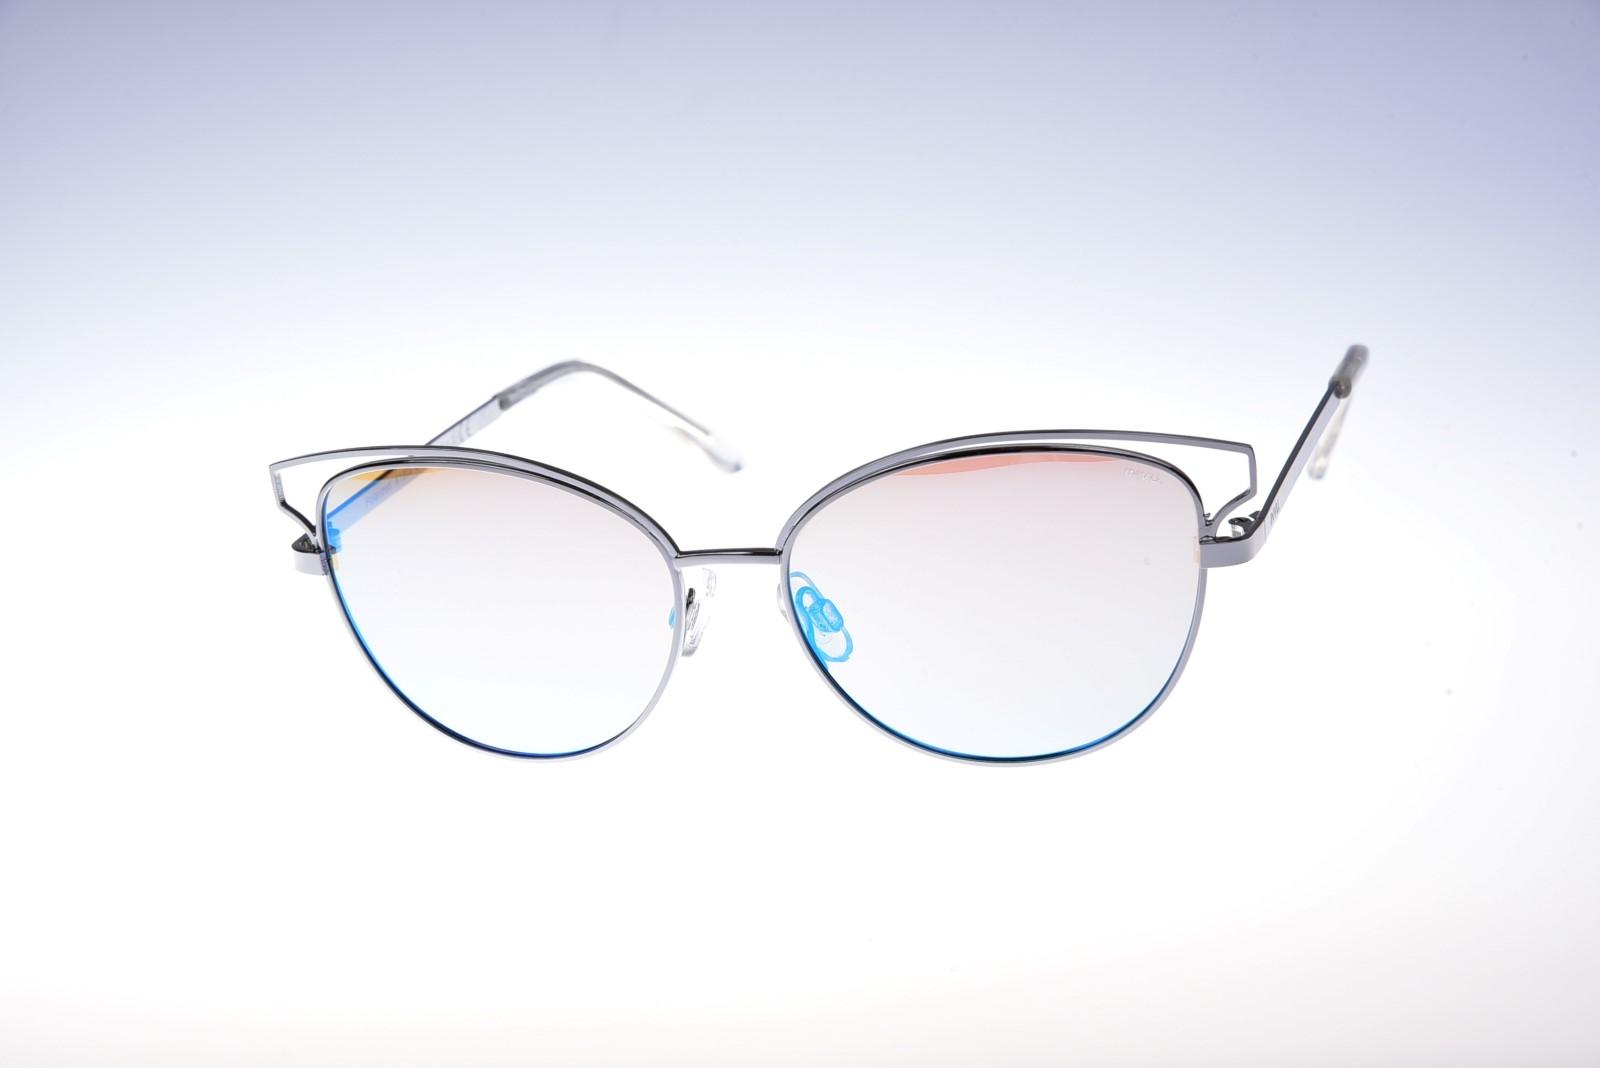 INVU. Kids K1800B - Slnečné okuliare pre deti 12-15 r.